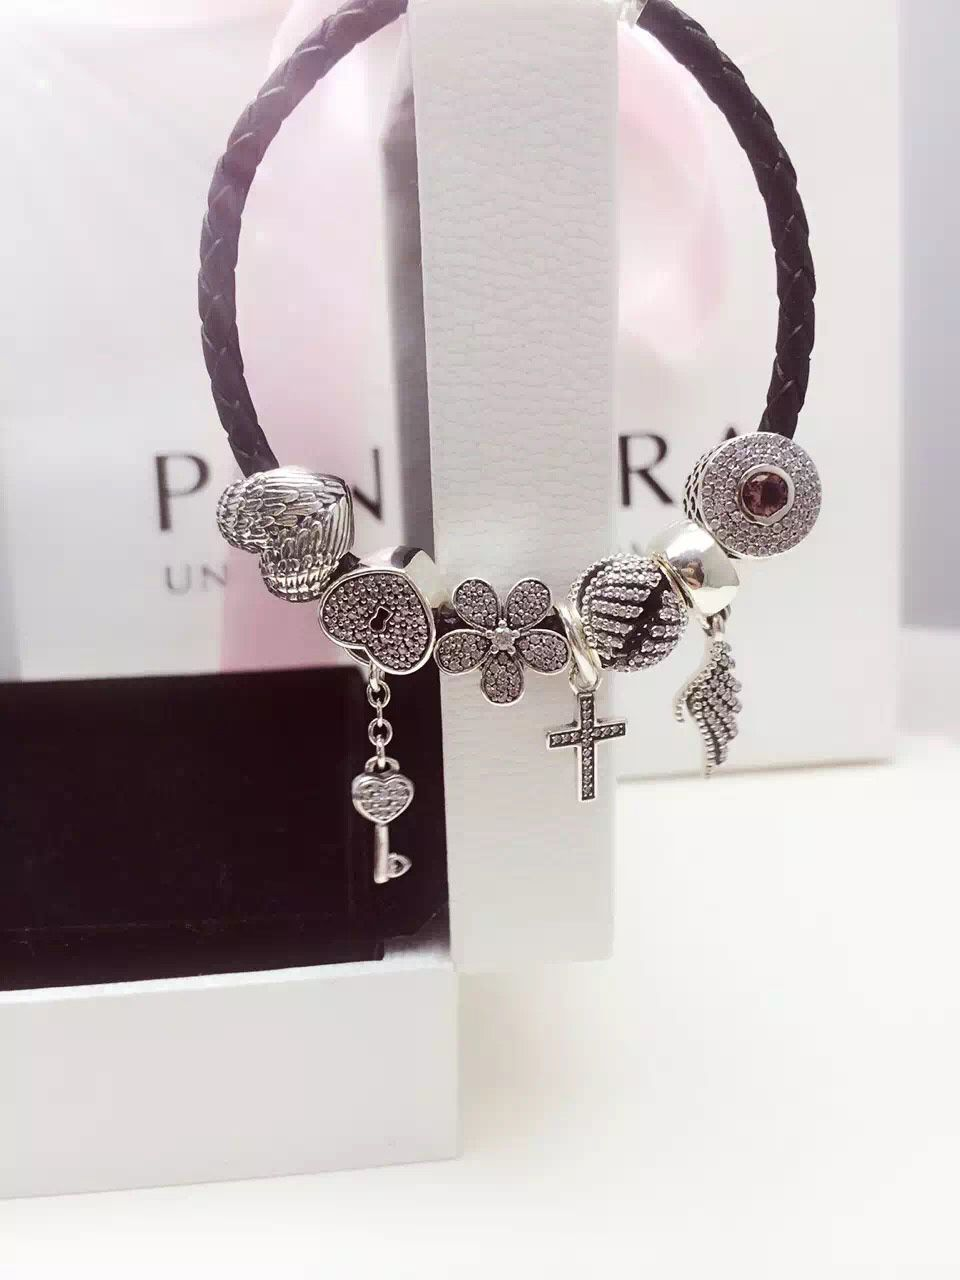 e93631236 50% OFF!!! $199 Pandora Leather Charm Bracelet Pink Black. Hot Sale ...